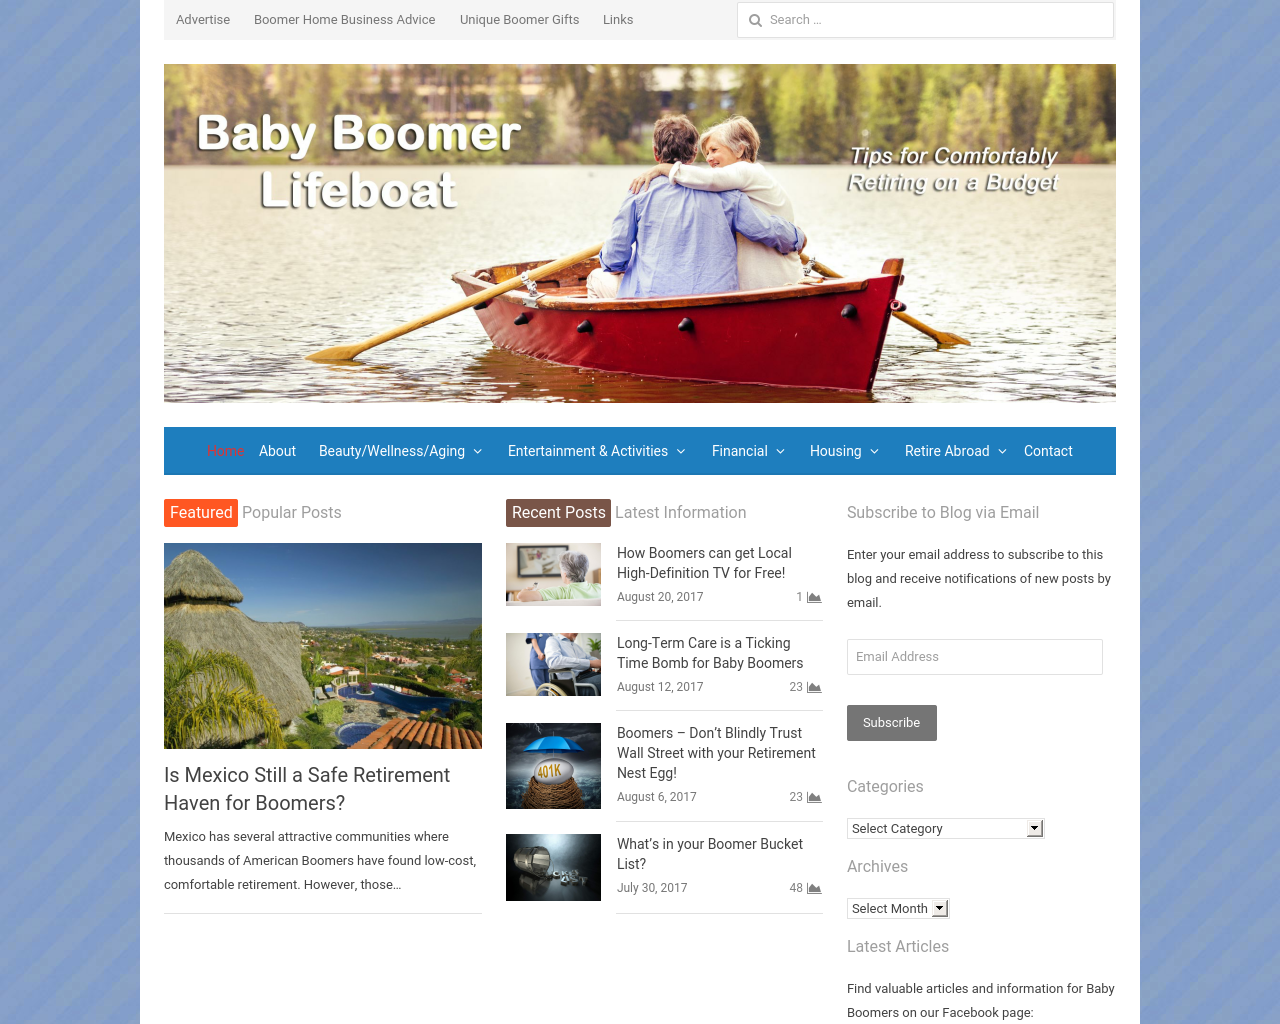 Baby-Boomer-Lifeboat-Advertising-Reviews-Pricing